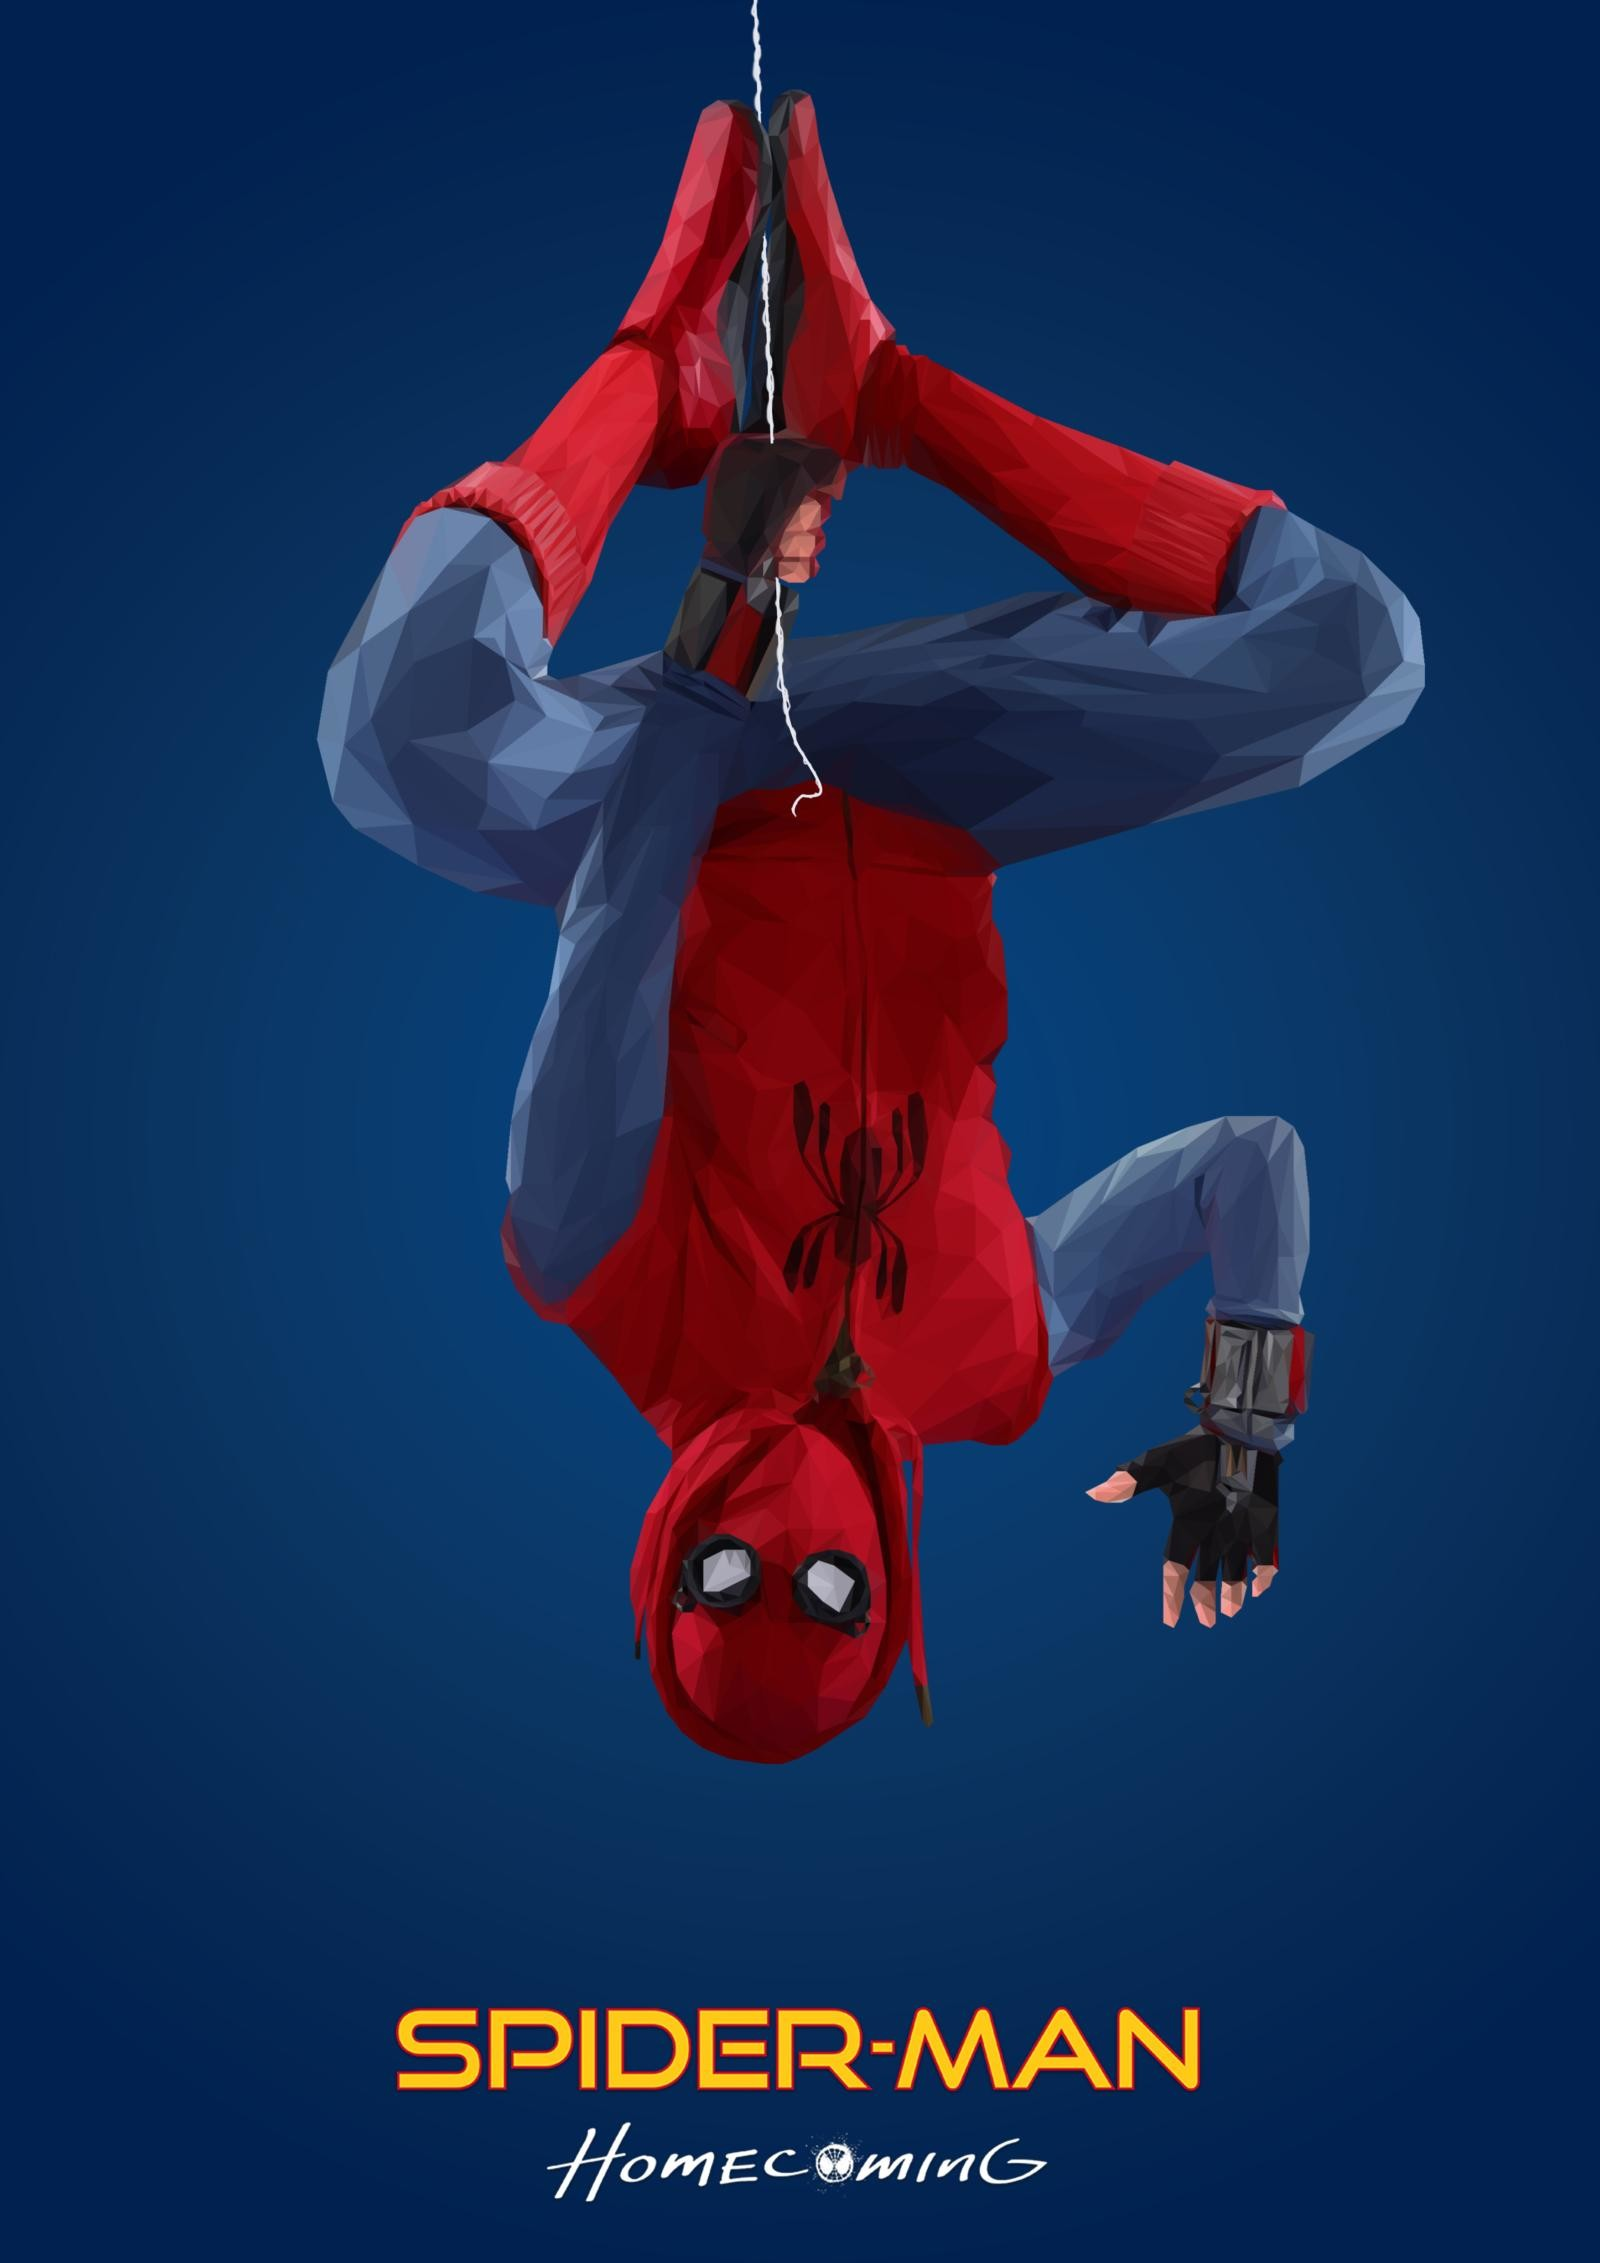 Spiderman cartoon wallpaper 75 images - Moving spider desktop ...